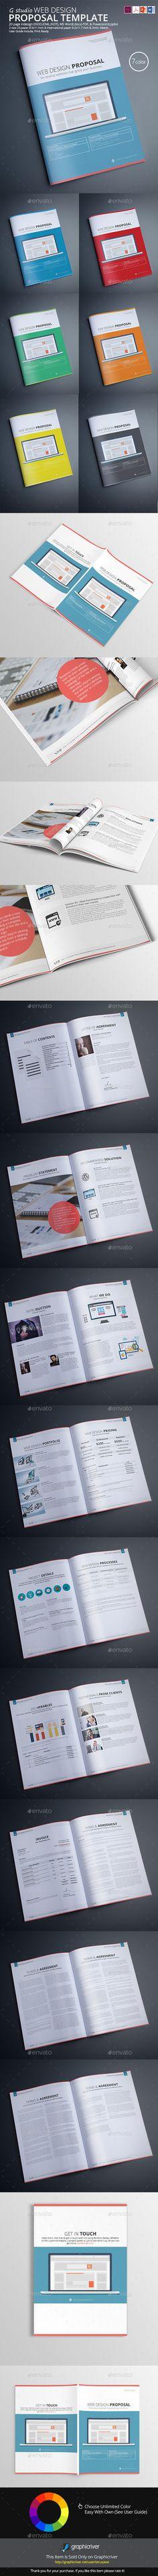 Web Design Proposal Template #design Download: http://graphicriver.net/item/web-design-proposal-template/12532855?ref=ksioks